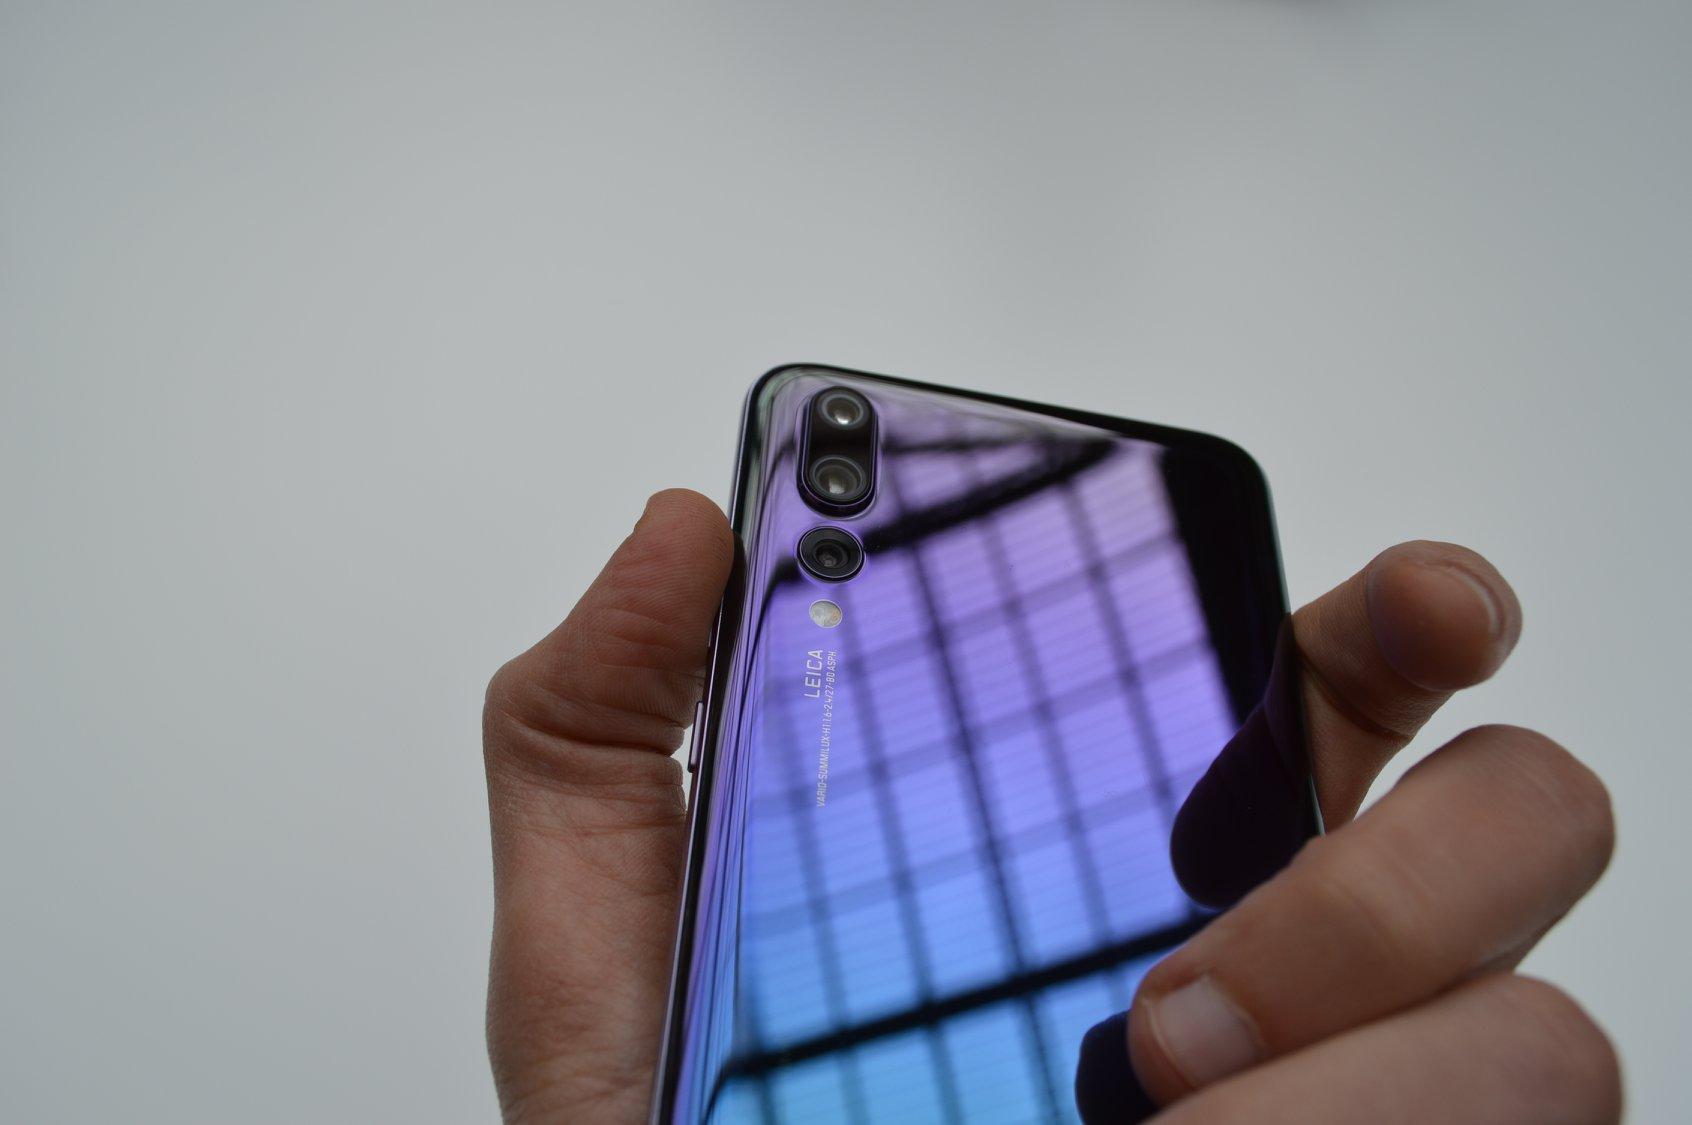 Huawei е продала над 6 милиона смартфона от серия P20